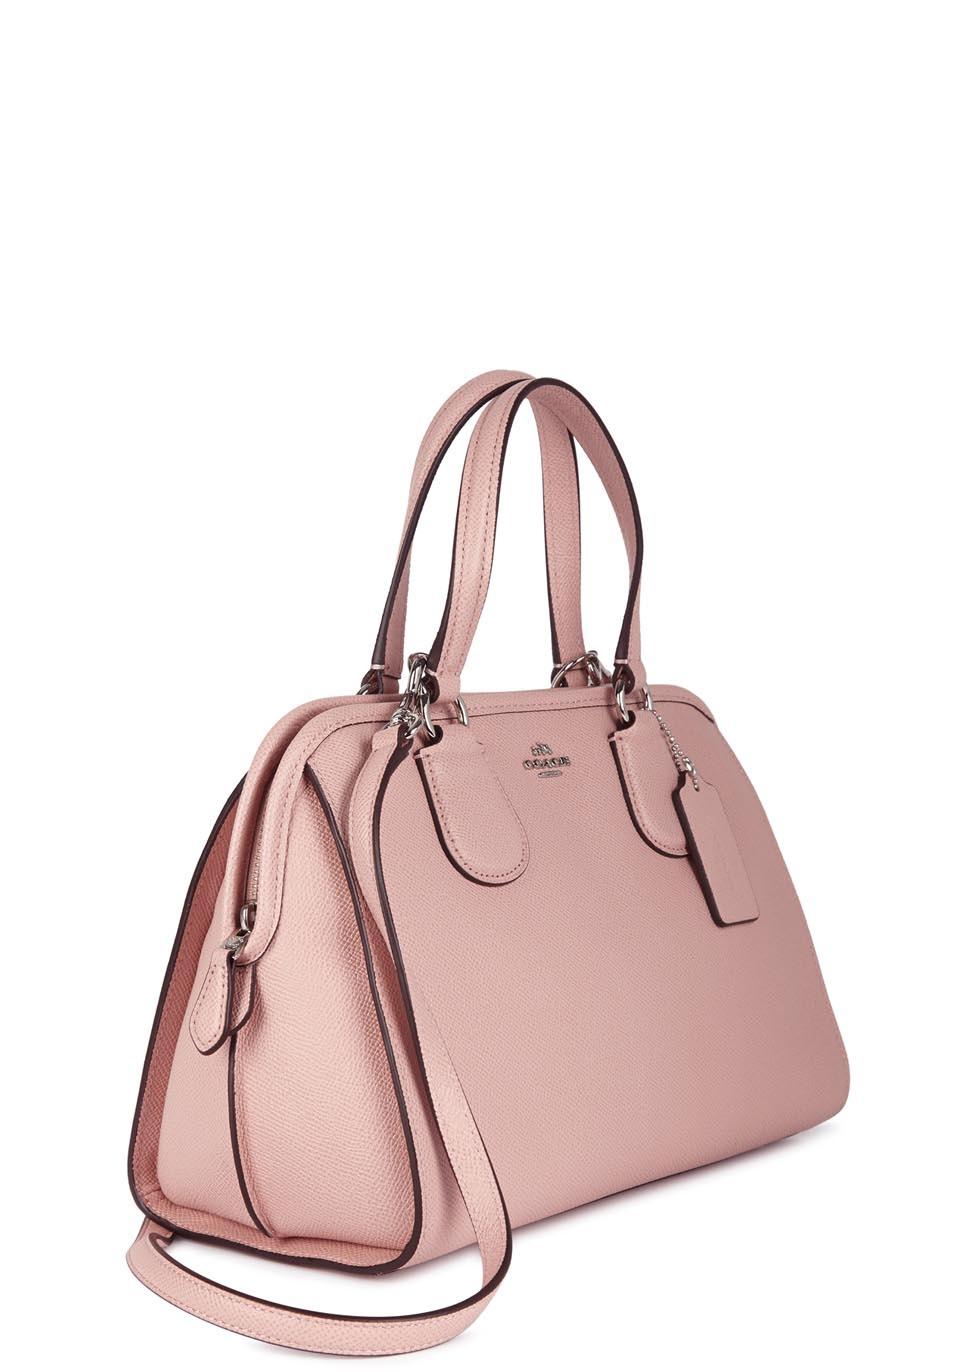 gallery for light pink coach handbags. Black Bedroom Furniture Sets. Home Design Ideas